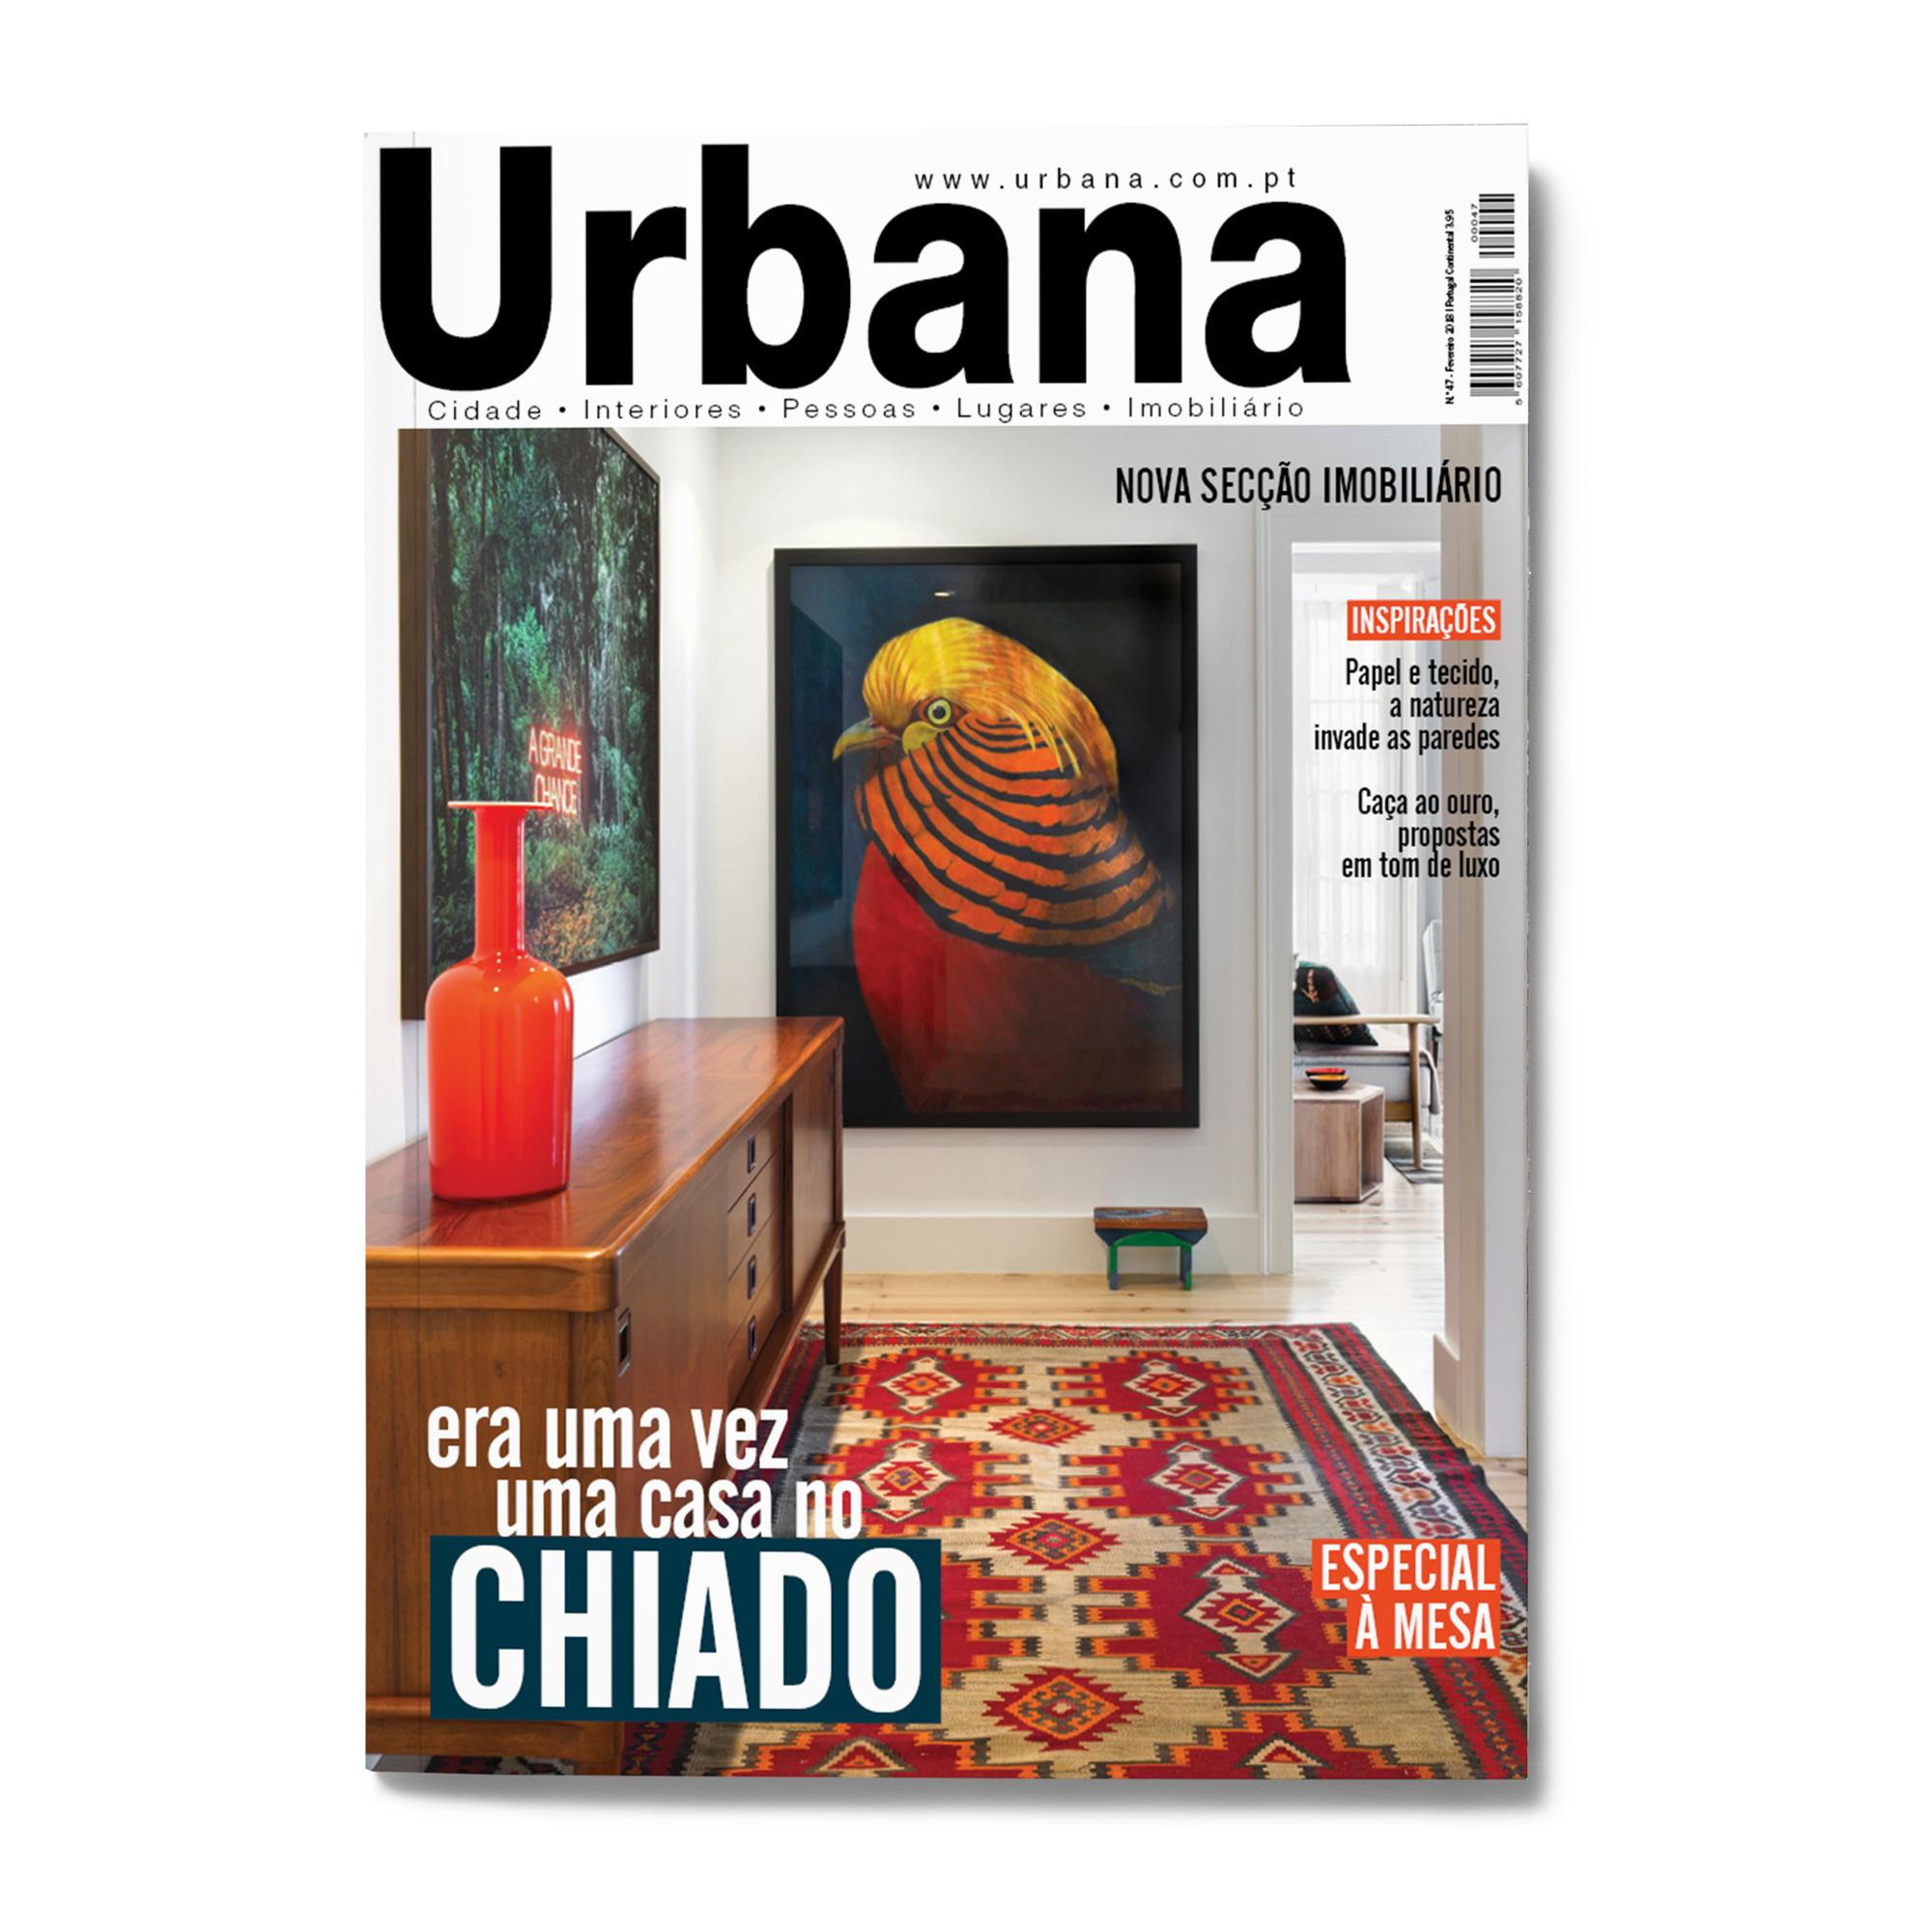 Urbana - DESIGN BY MIGUEL SOEIRO